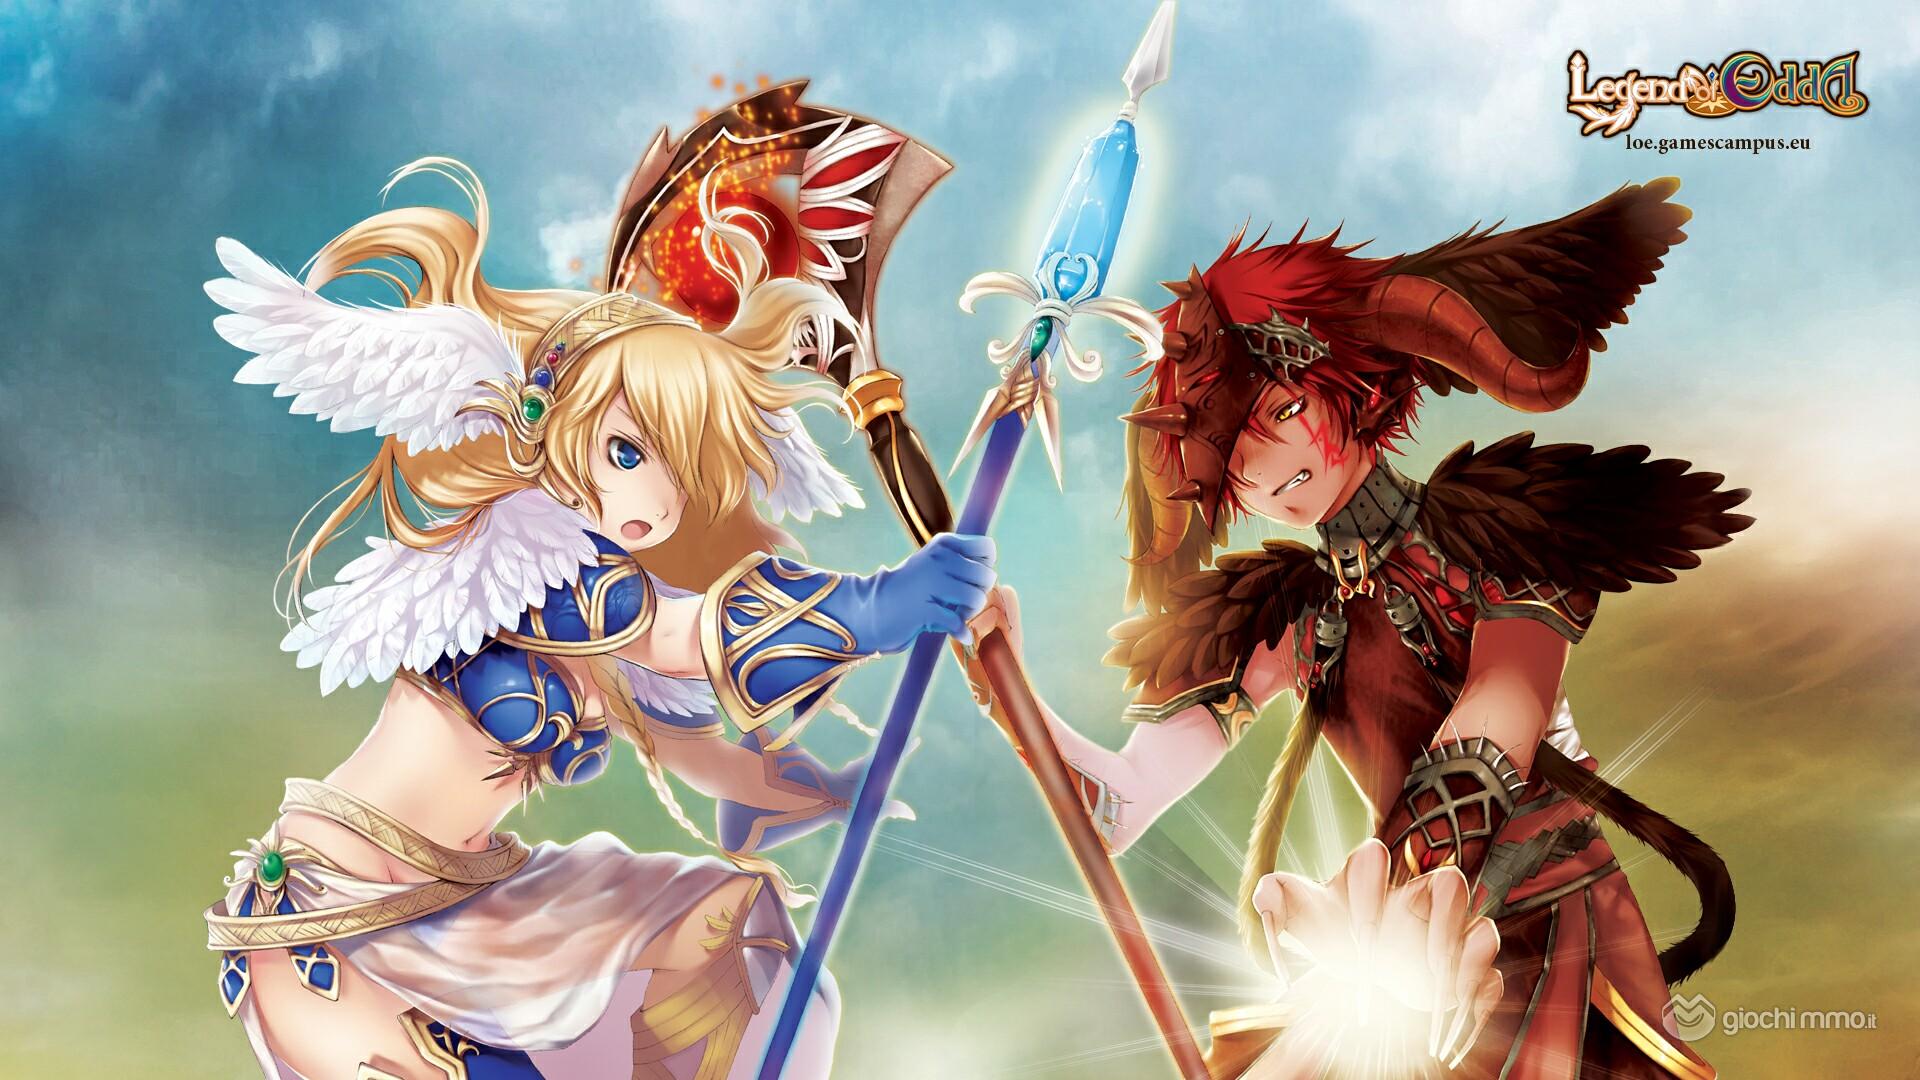 Clicca sull'immagine per ingrandirlaNome: Legend of edda screen2.jpgVisite: 58Dimensione: 462.9 KBID: 8532